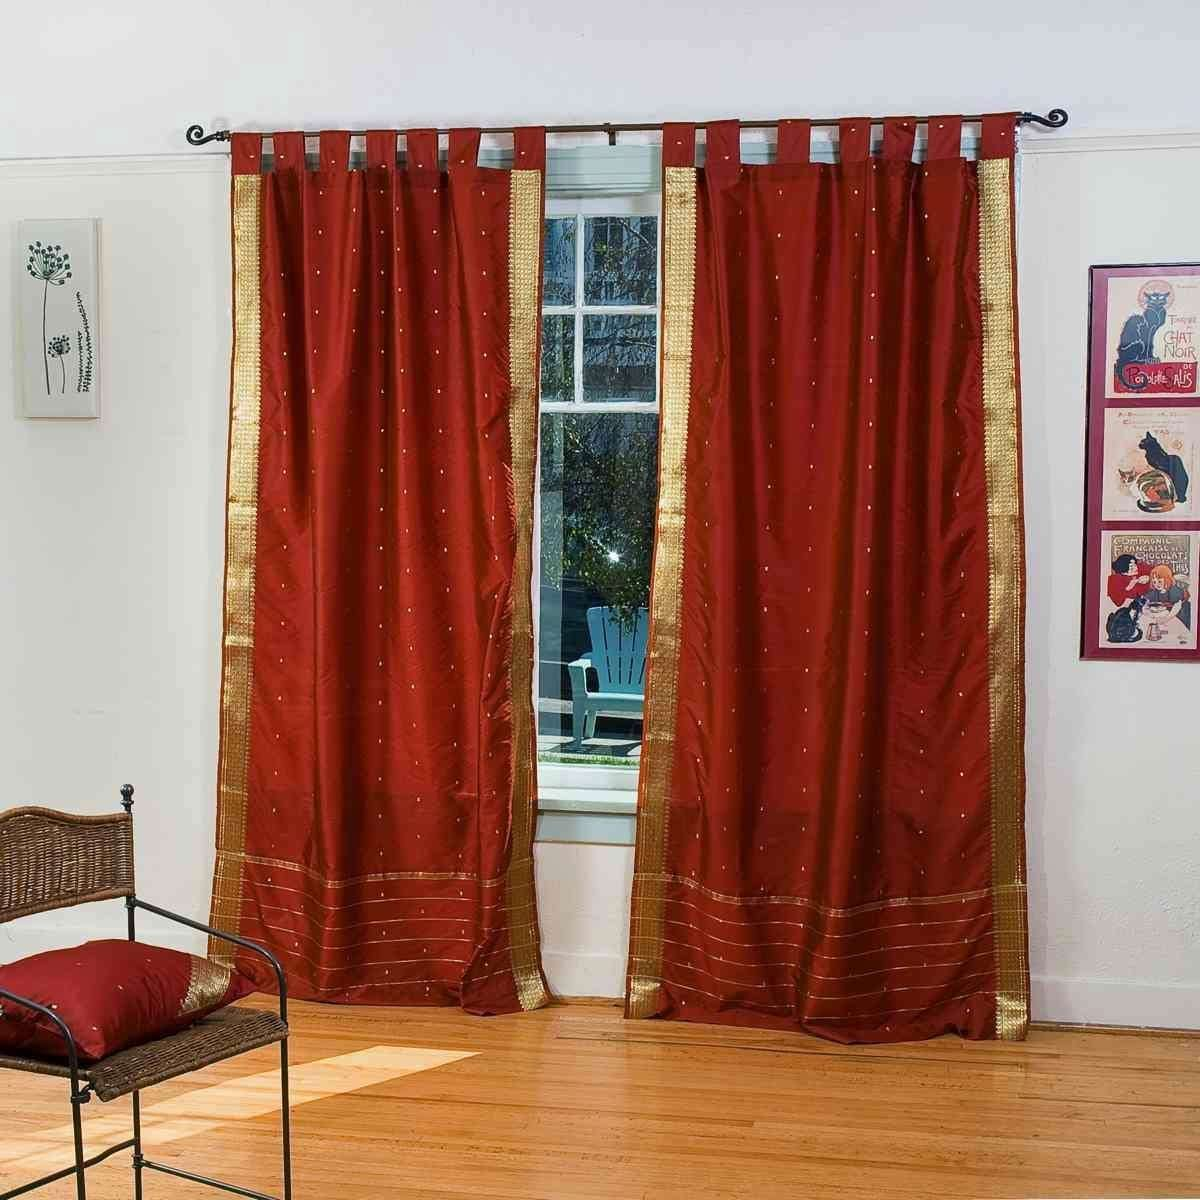 Indian Selections Lined-Rust Tab Top Sheer Sari Curtain Drape Panel – 80W x 120L – Pair